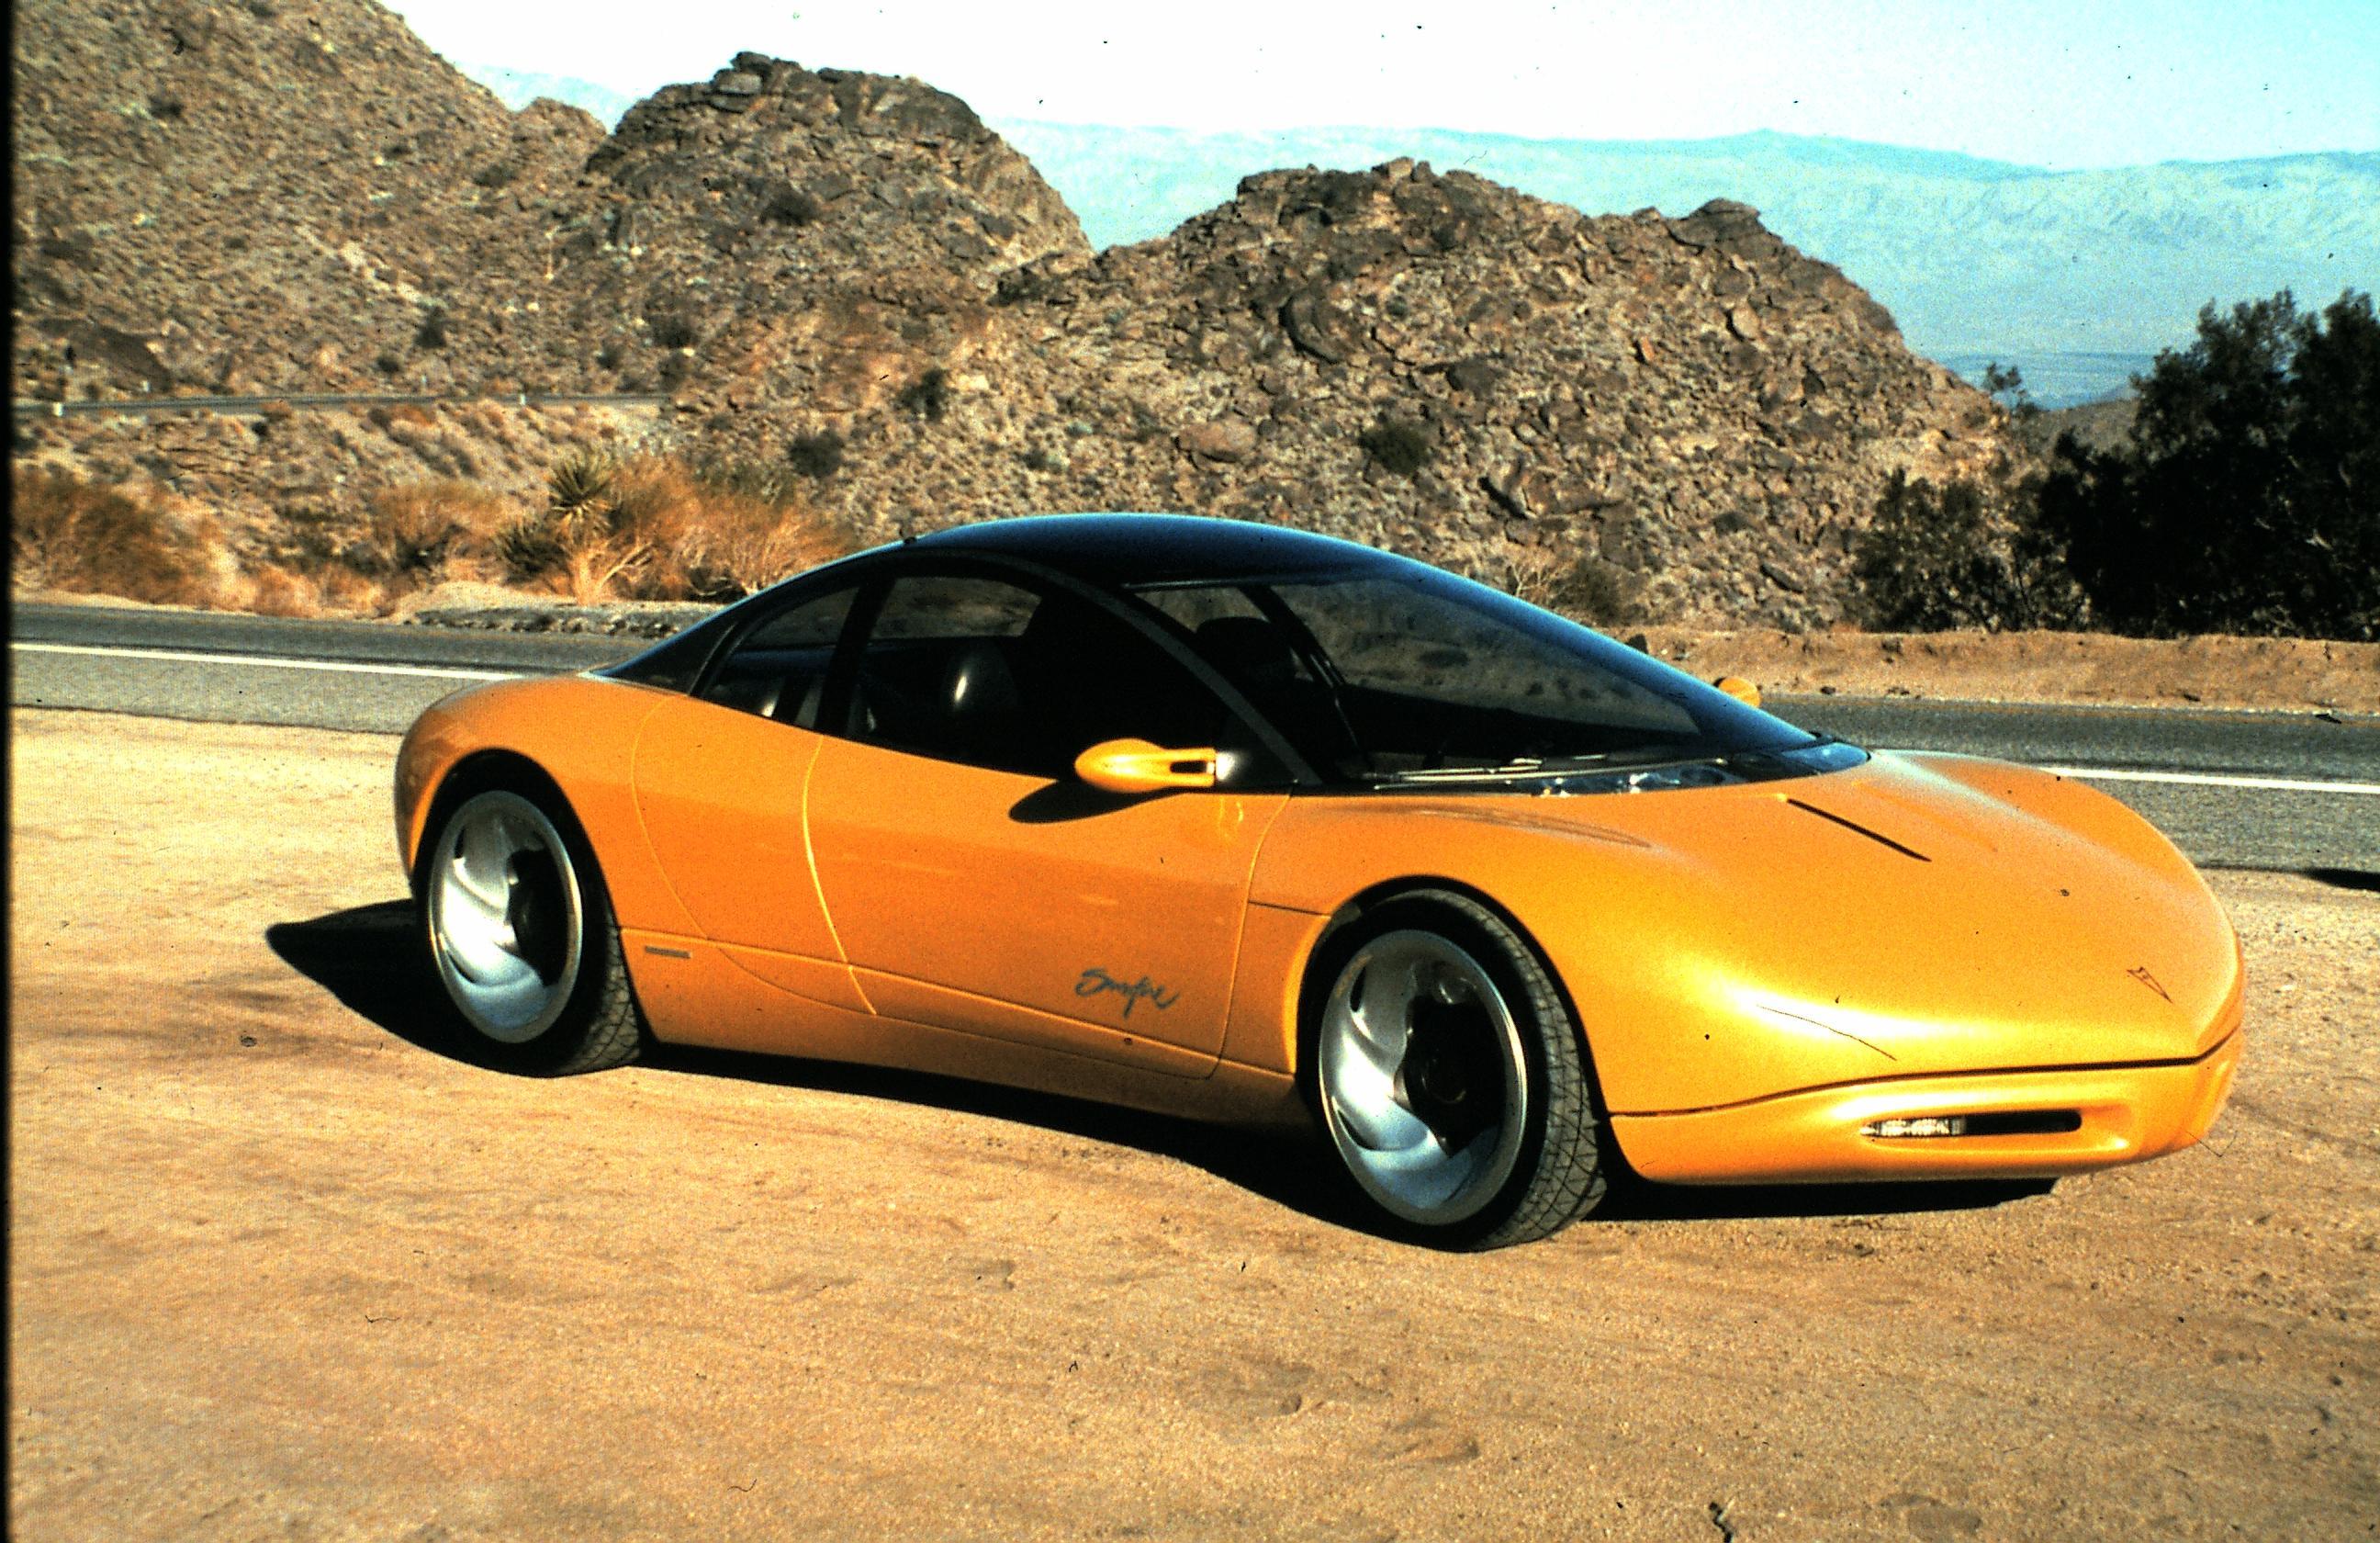 1990 Pontiac Sunfire 2 2 Концепты